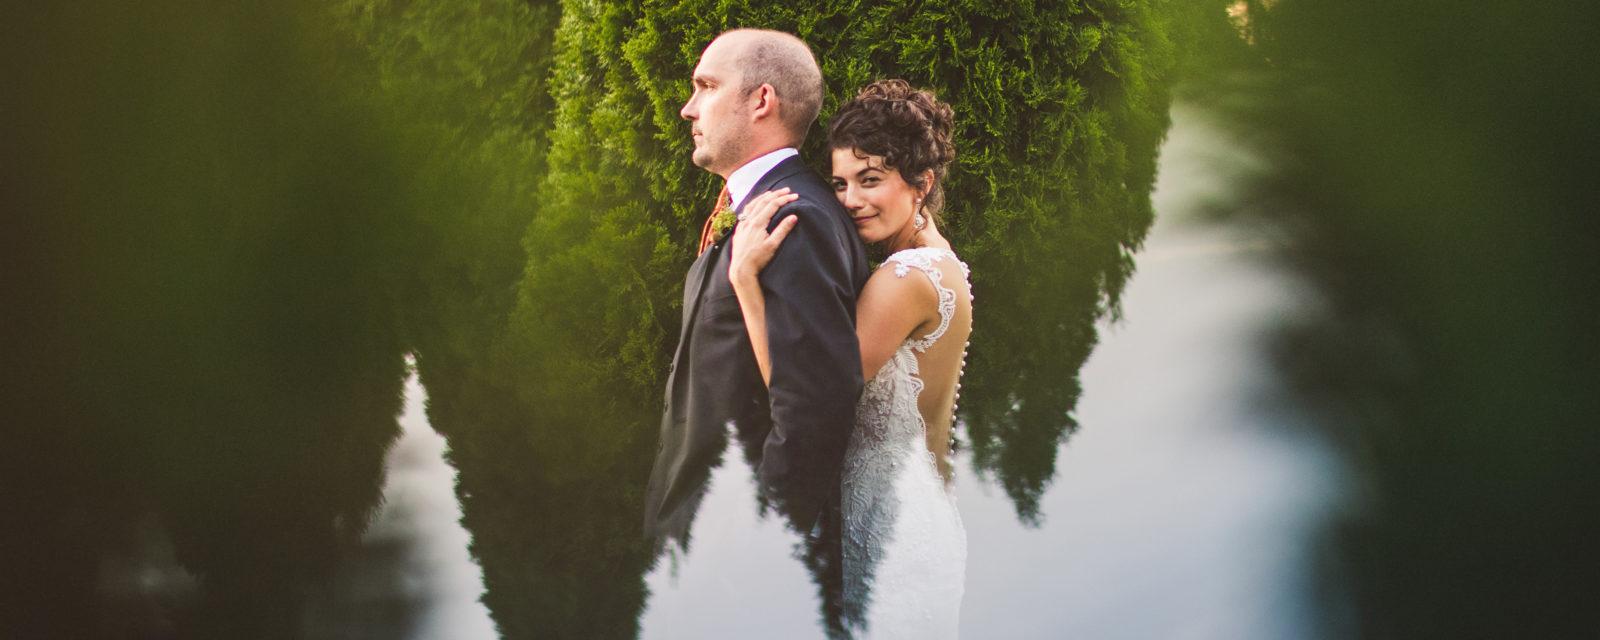 allison + chris // antrim 1844 wedding